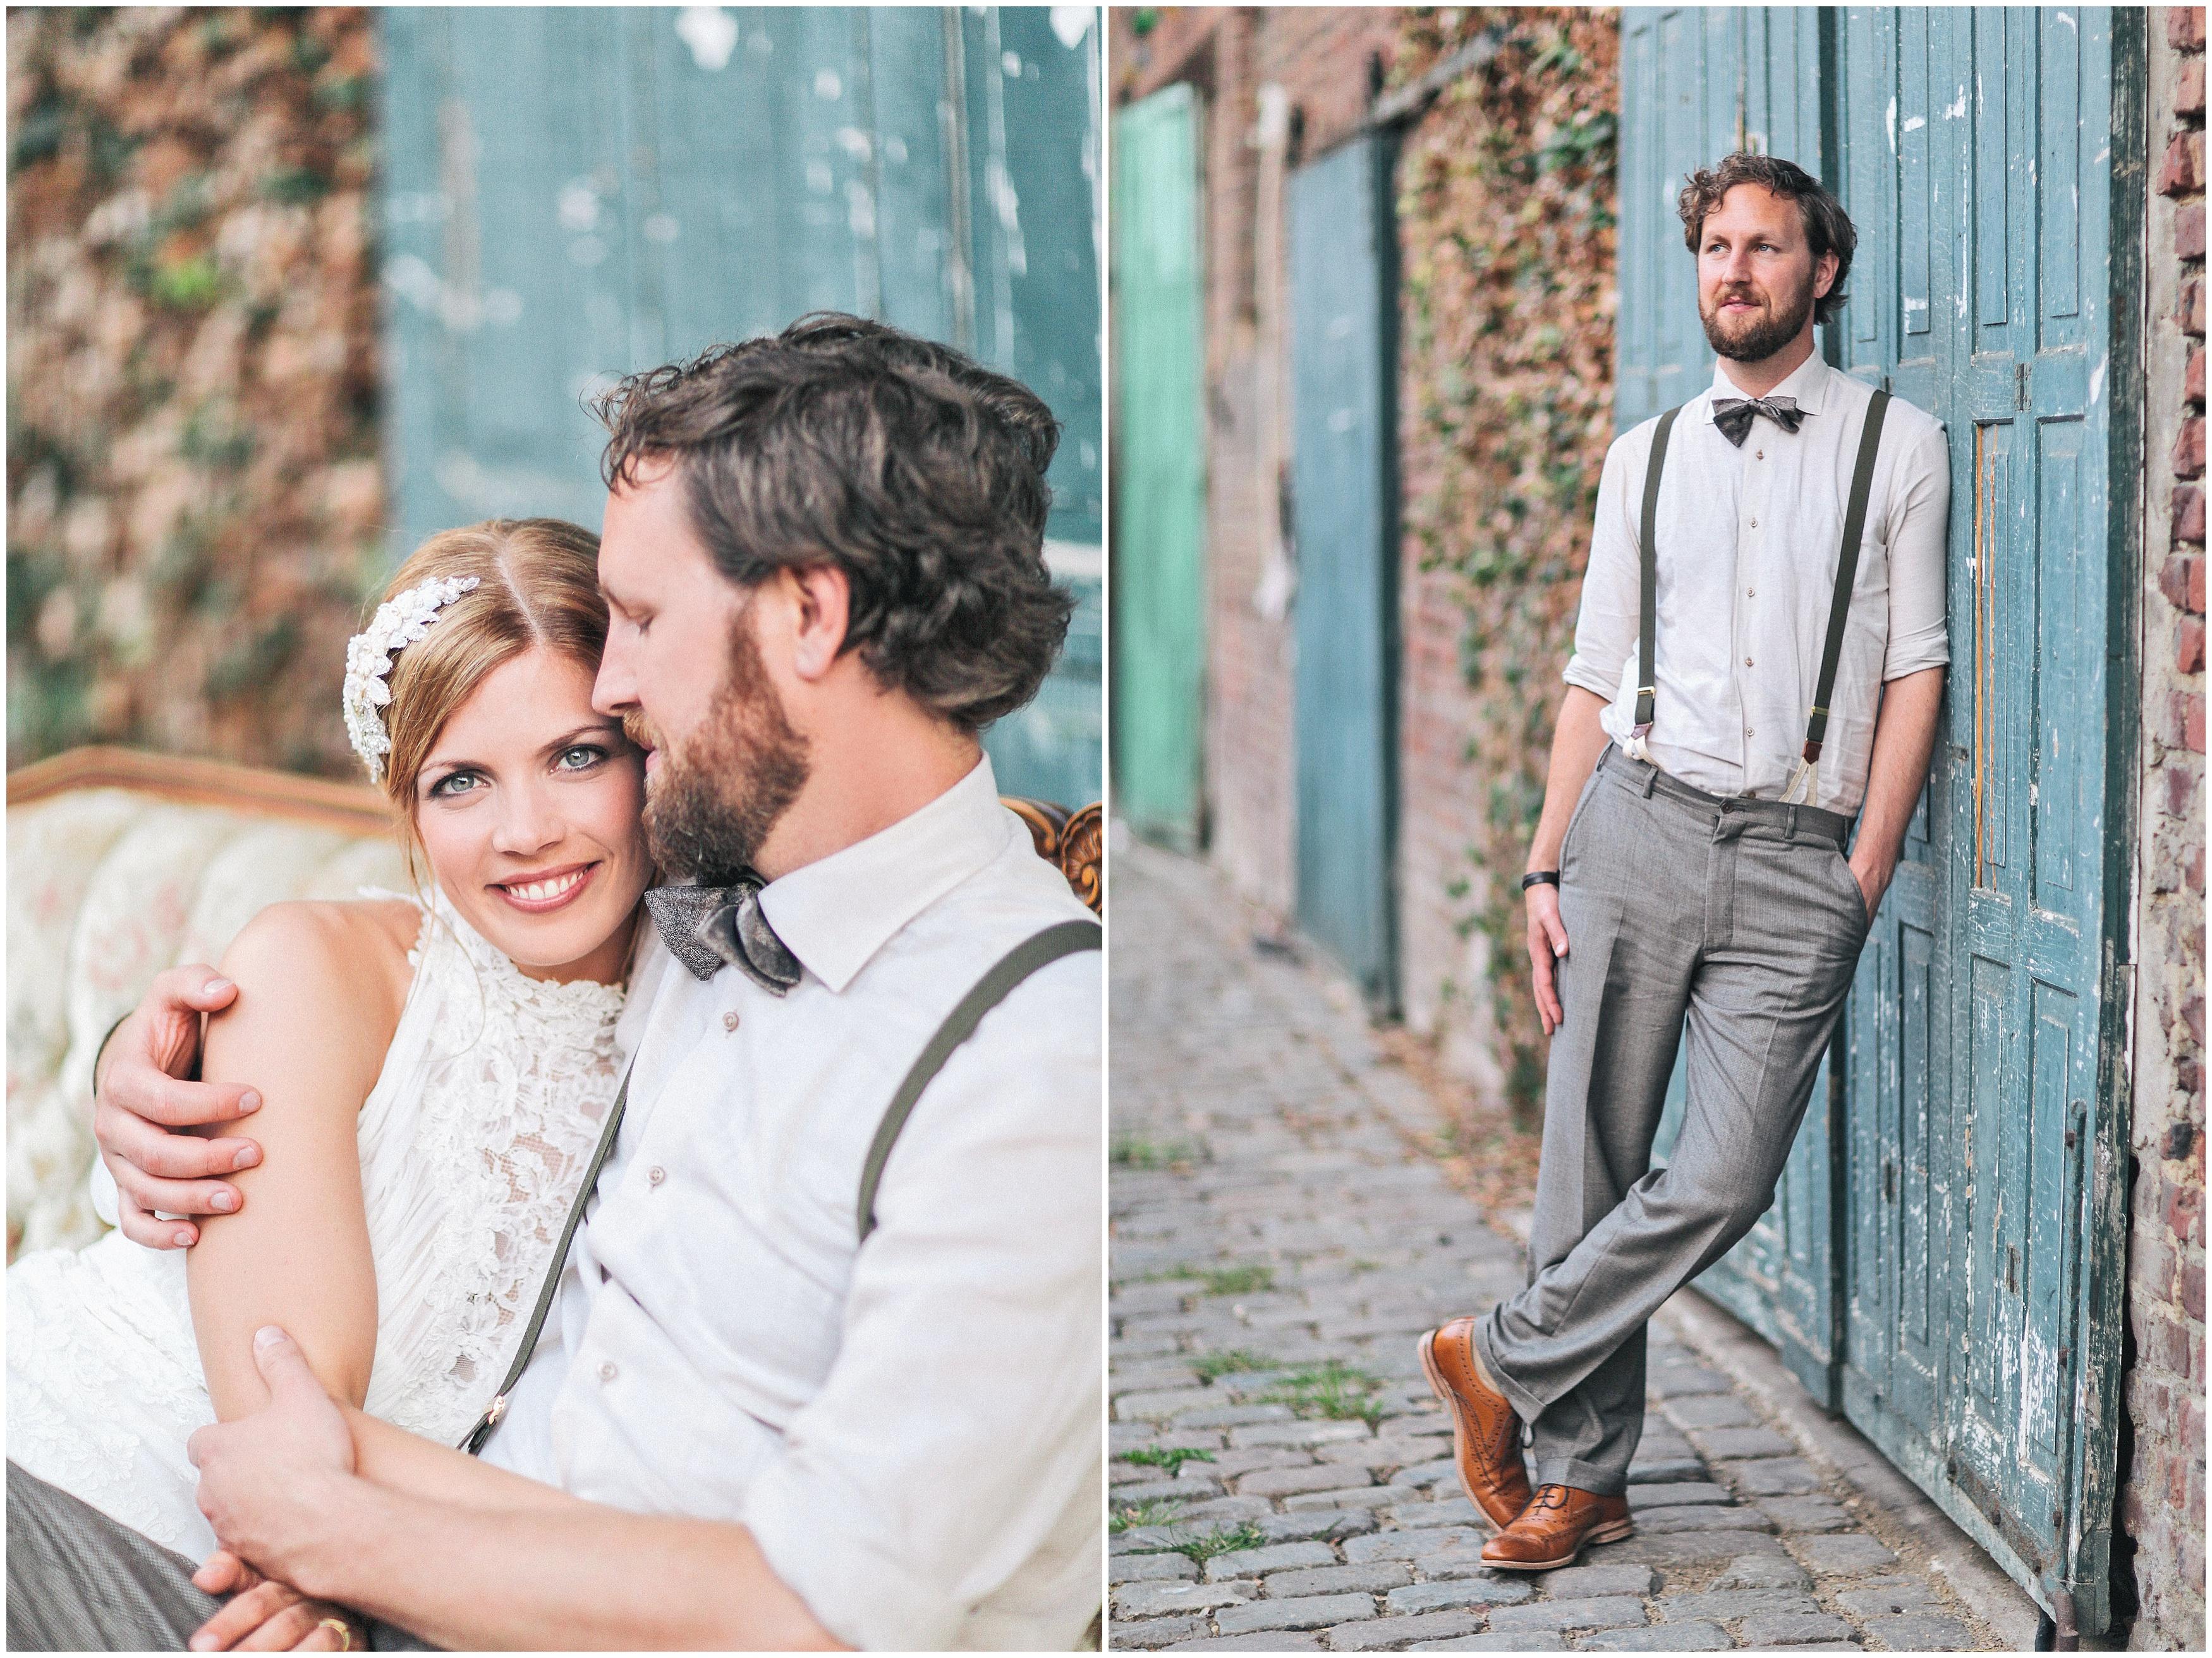 ivy&olive_Hochzeitsplanung_Nancy_Ebert_Fotografie_Vintage_Wedding_0018